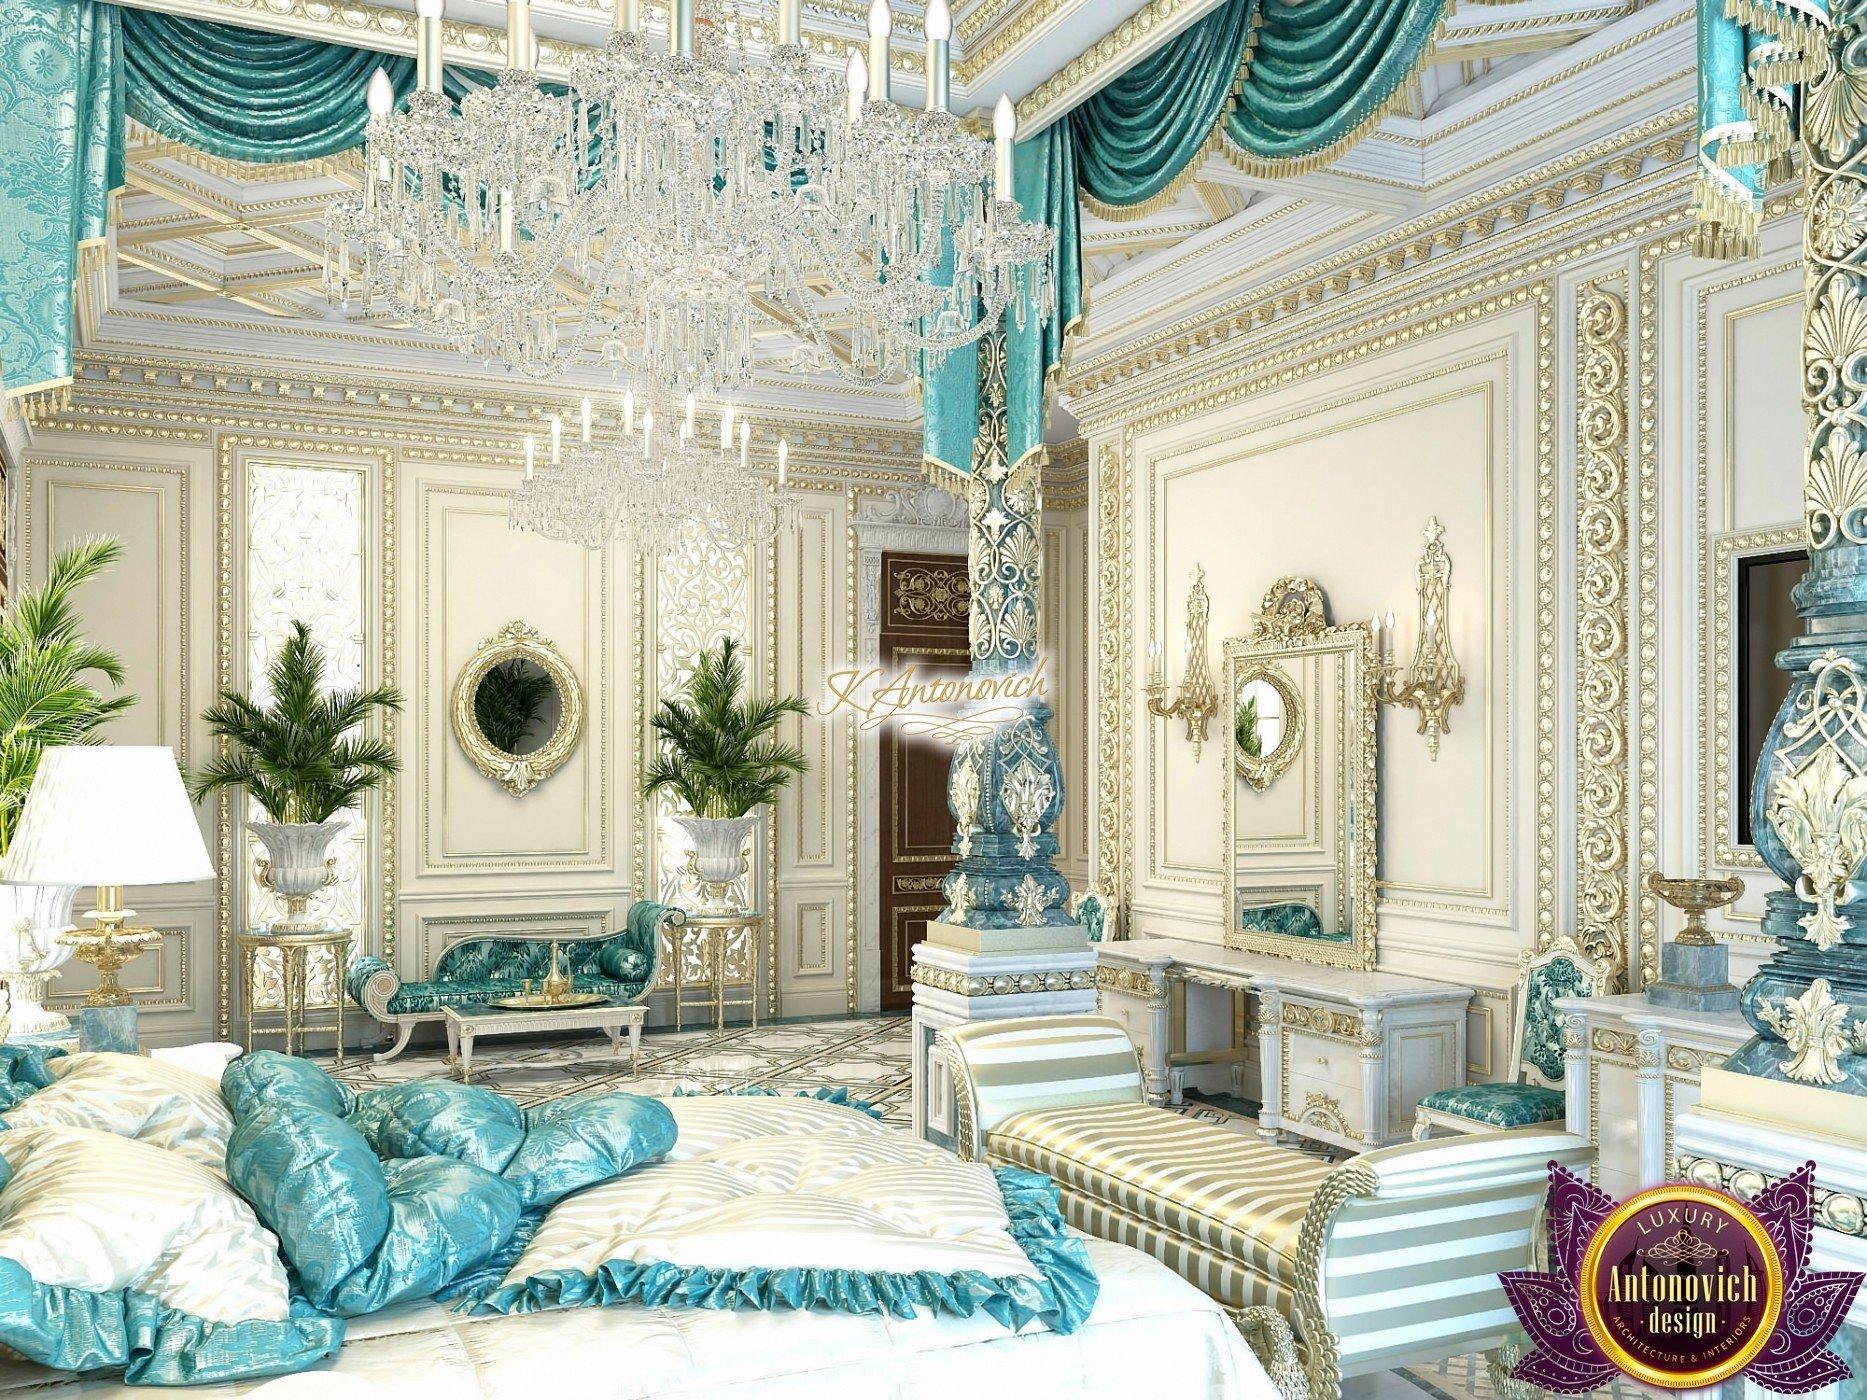 Best luxury Royal Master bedroom design ideas on Best Master Bedroom Designs  id=11414